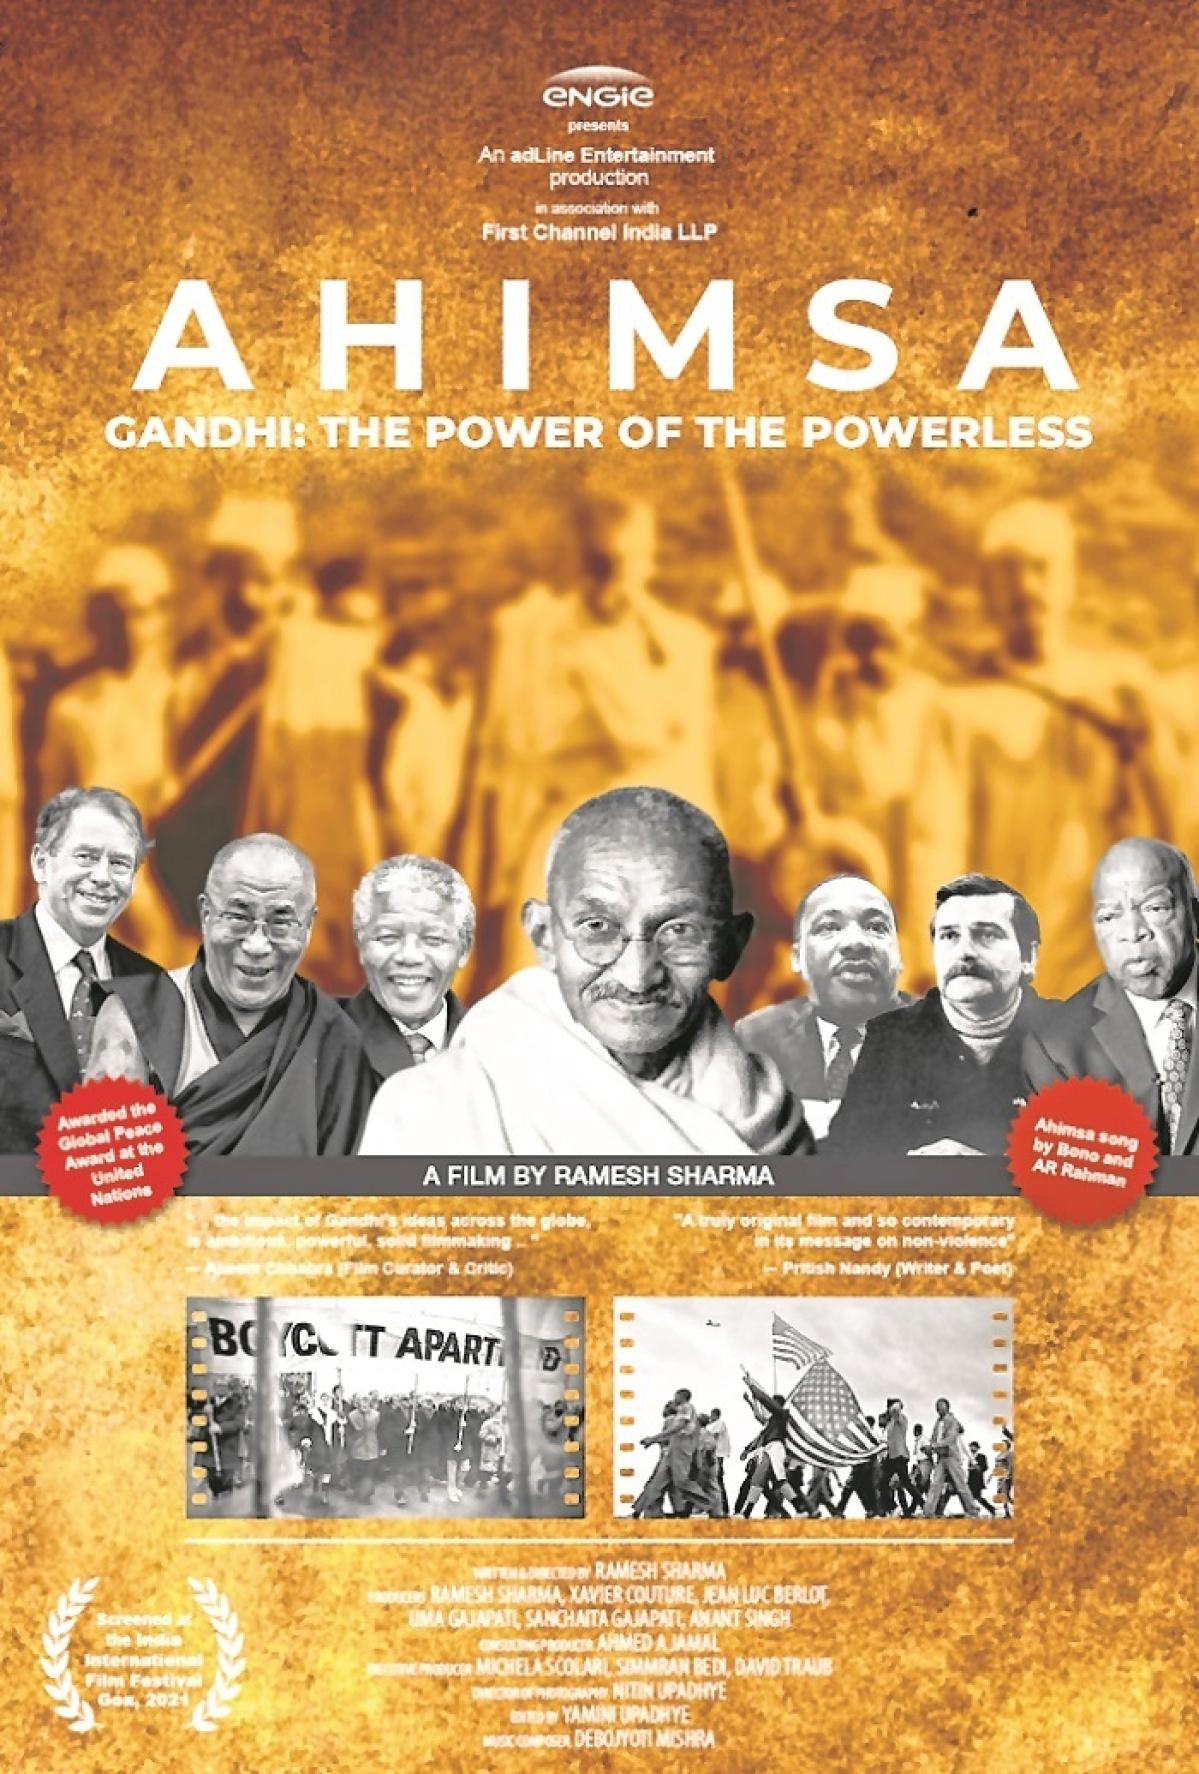 NYIFF 2021: Gandhi film honoured